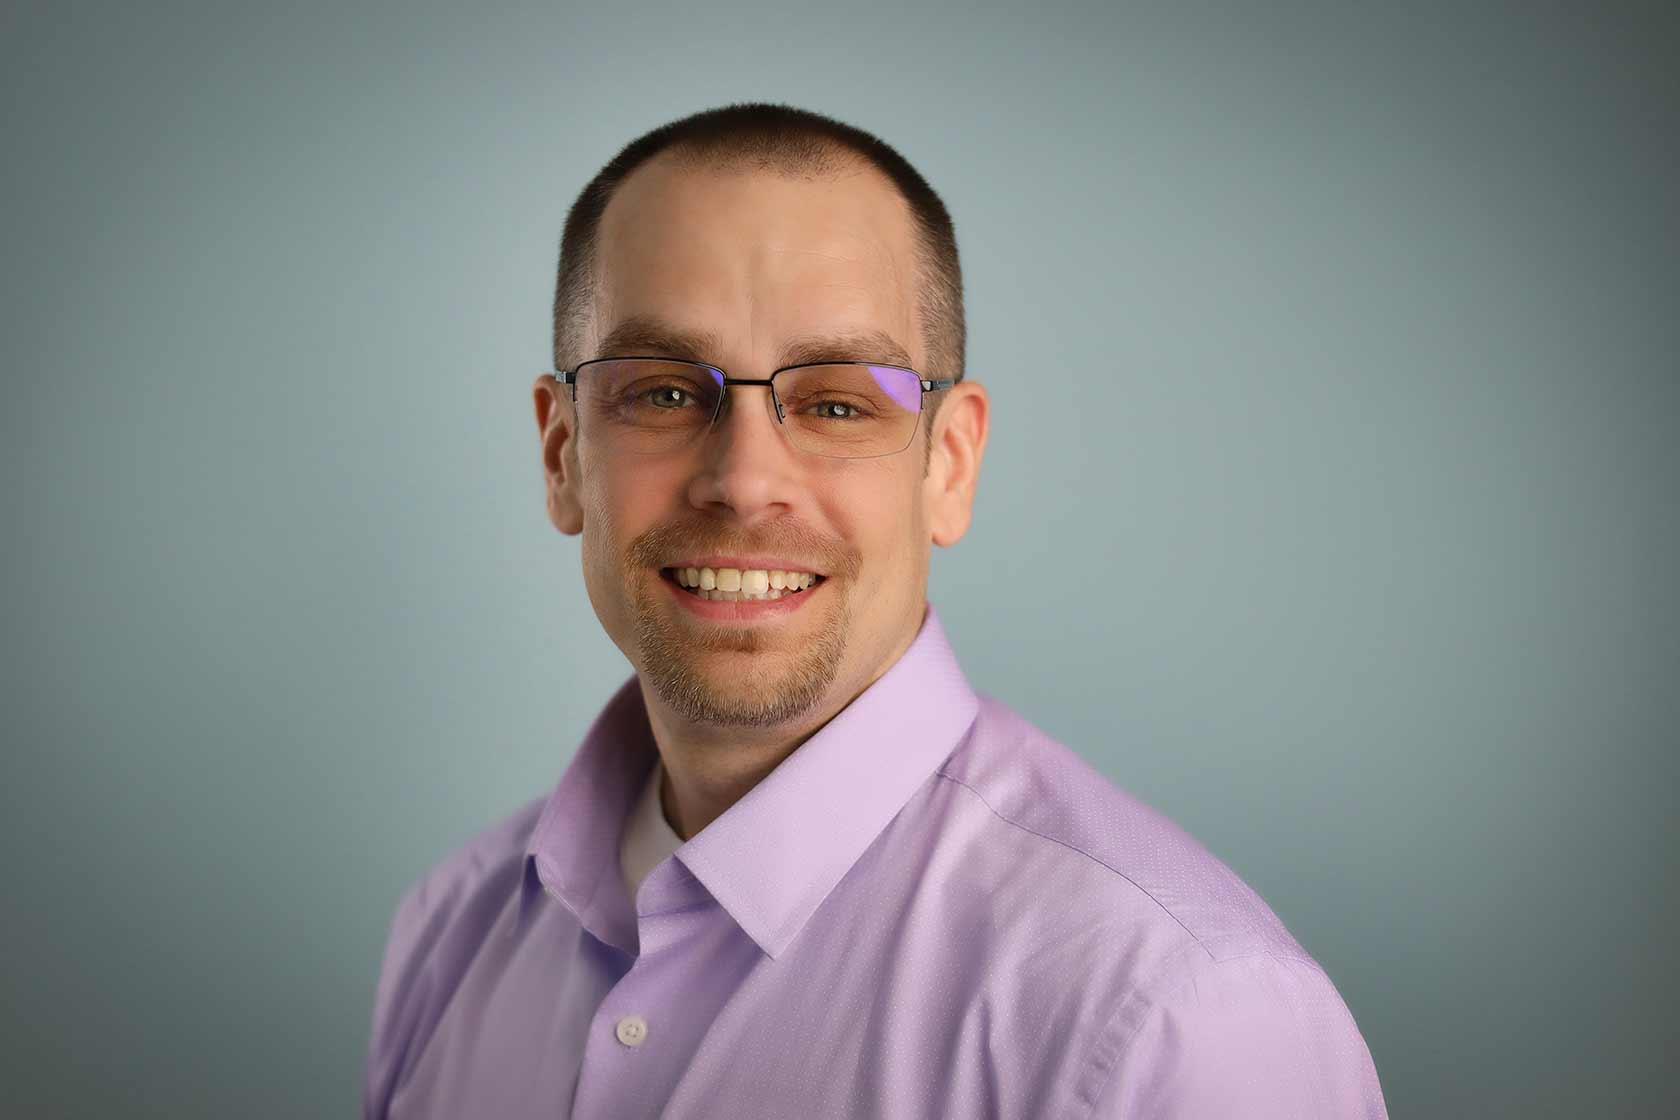 Dr. Jonathan Zwerka